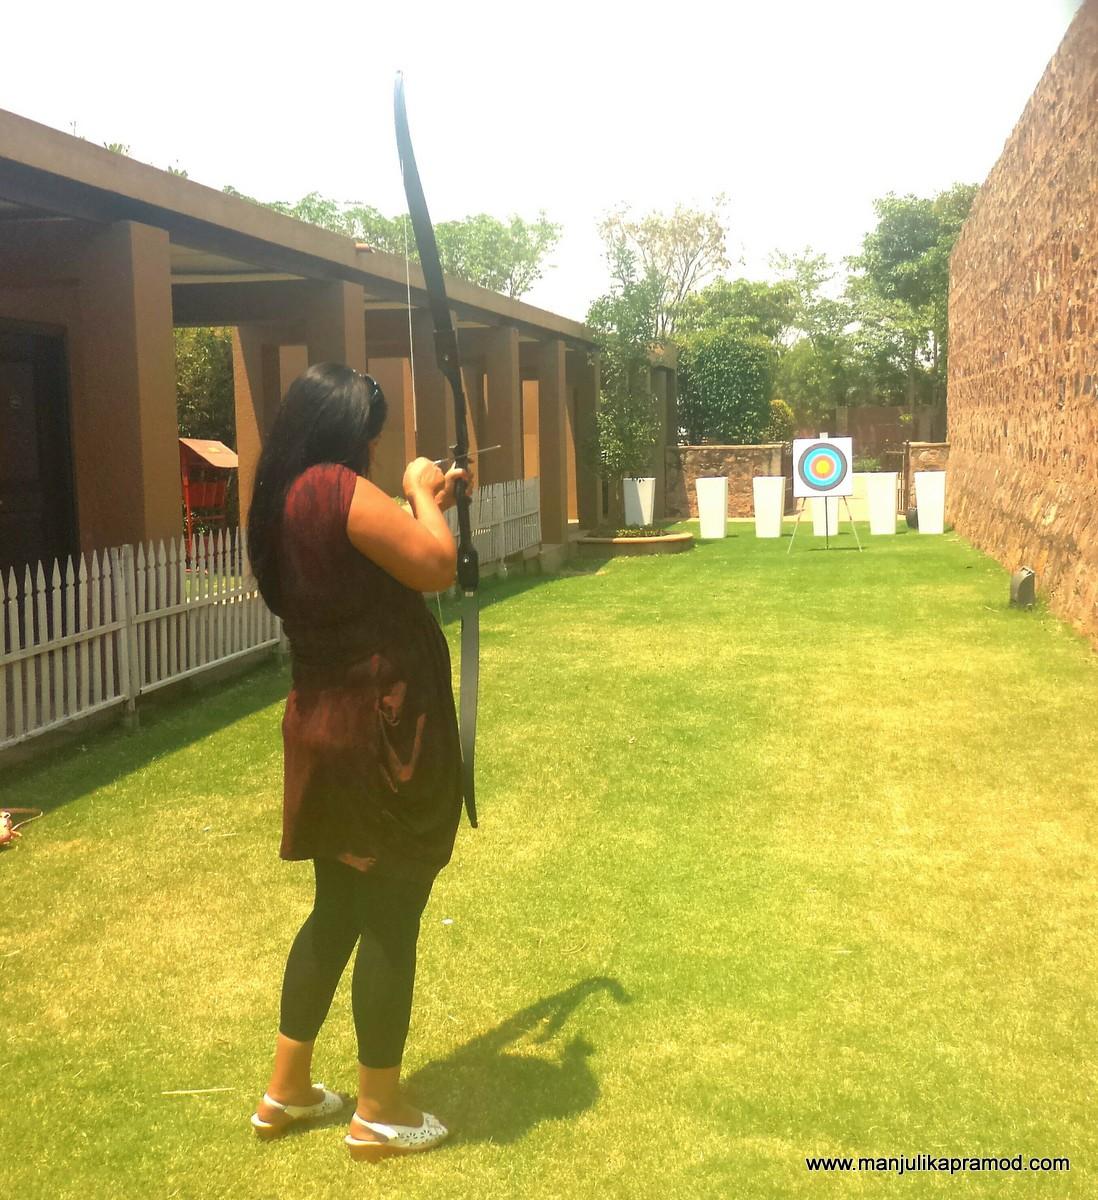 Archery in Delhi-NCR, Lemon Tree